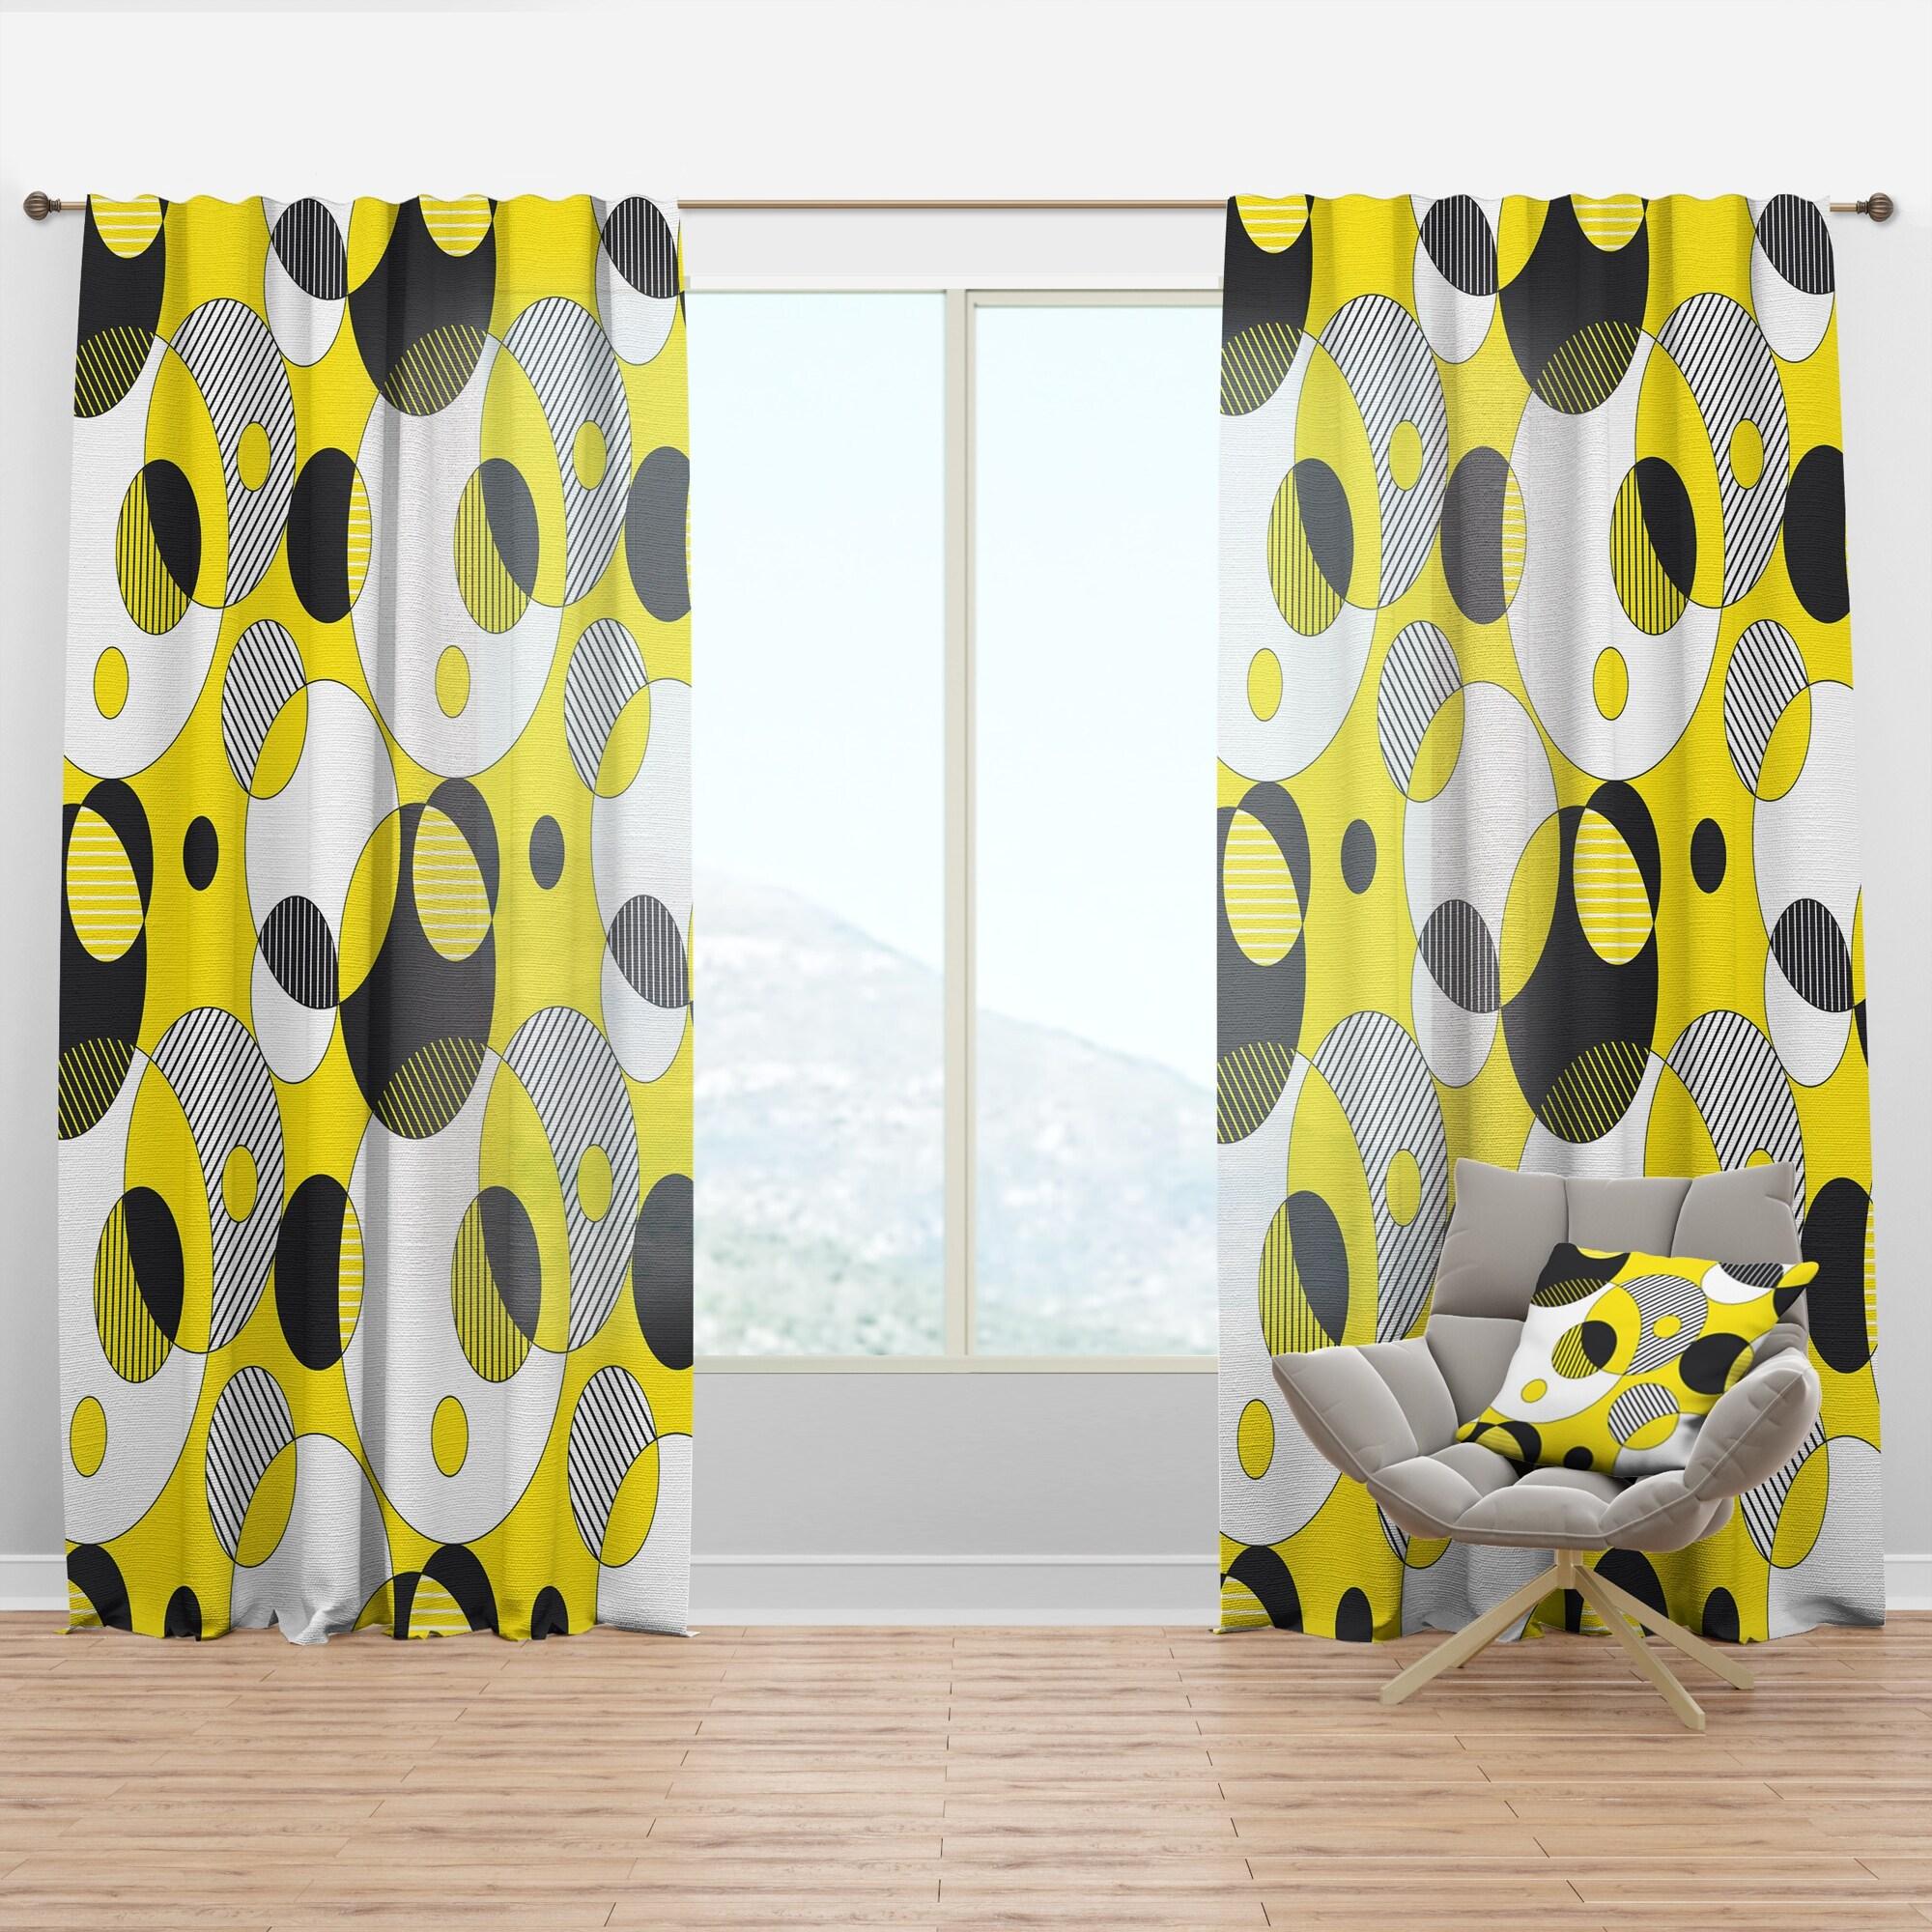 Designart Circular Abstract Retro Geometric I Mid Century Modern Curtain Panel Overstock 29626008